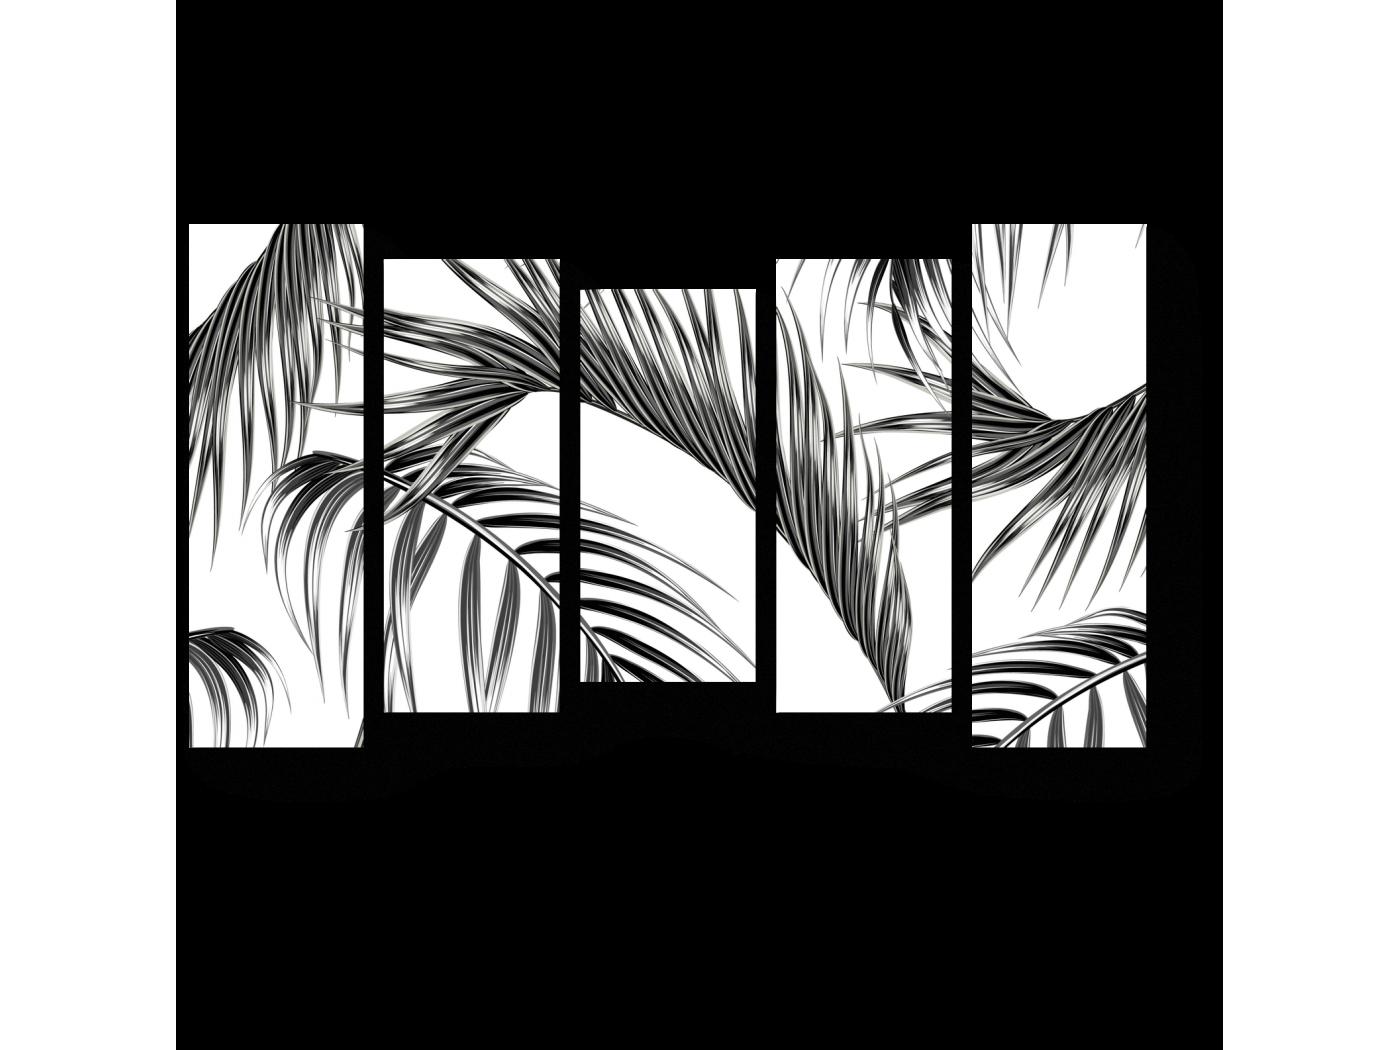 Модульная картина Листья (90x54)